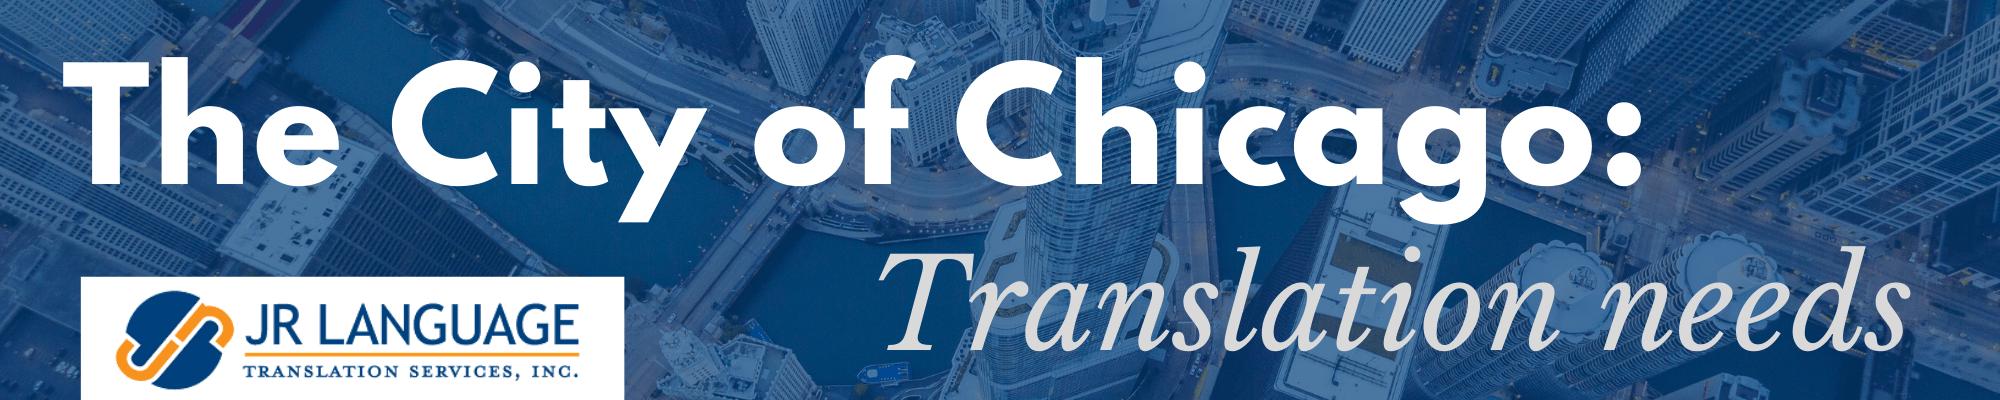 Chicago Translation Services Company manage needs